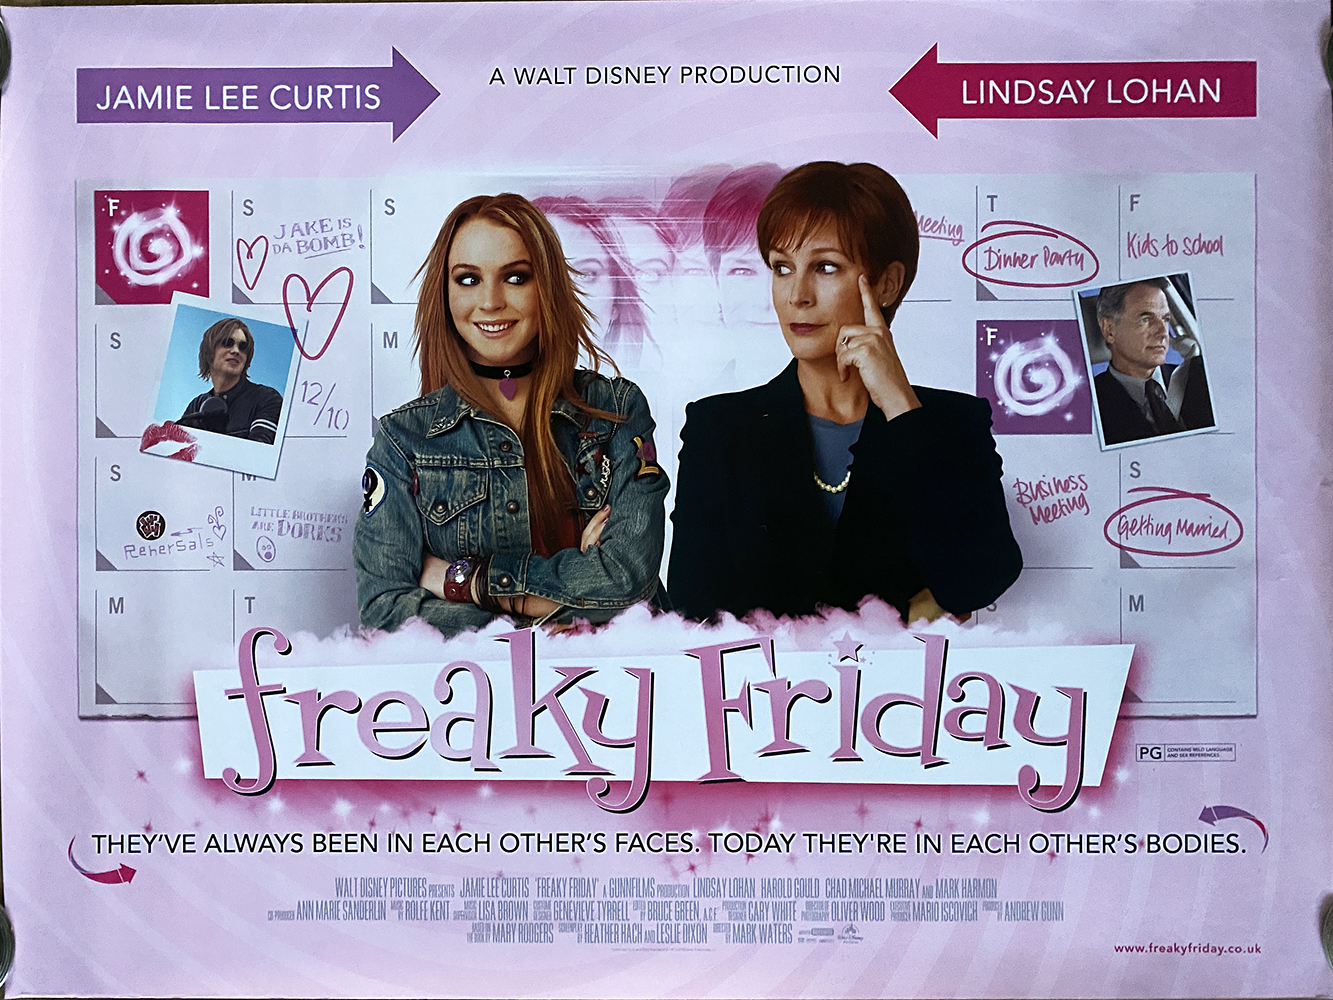 Freakyfriday2